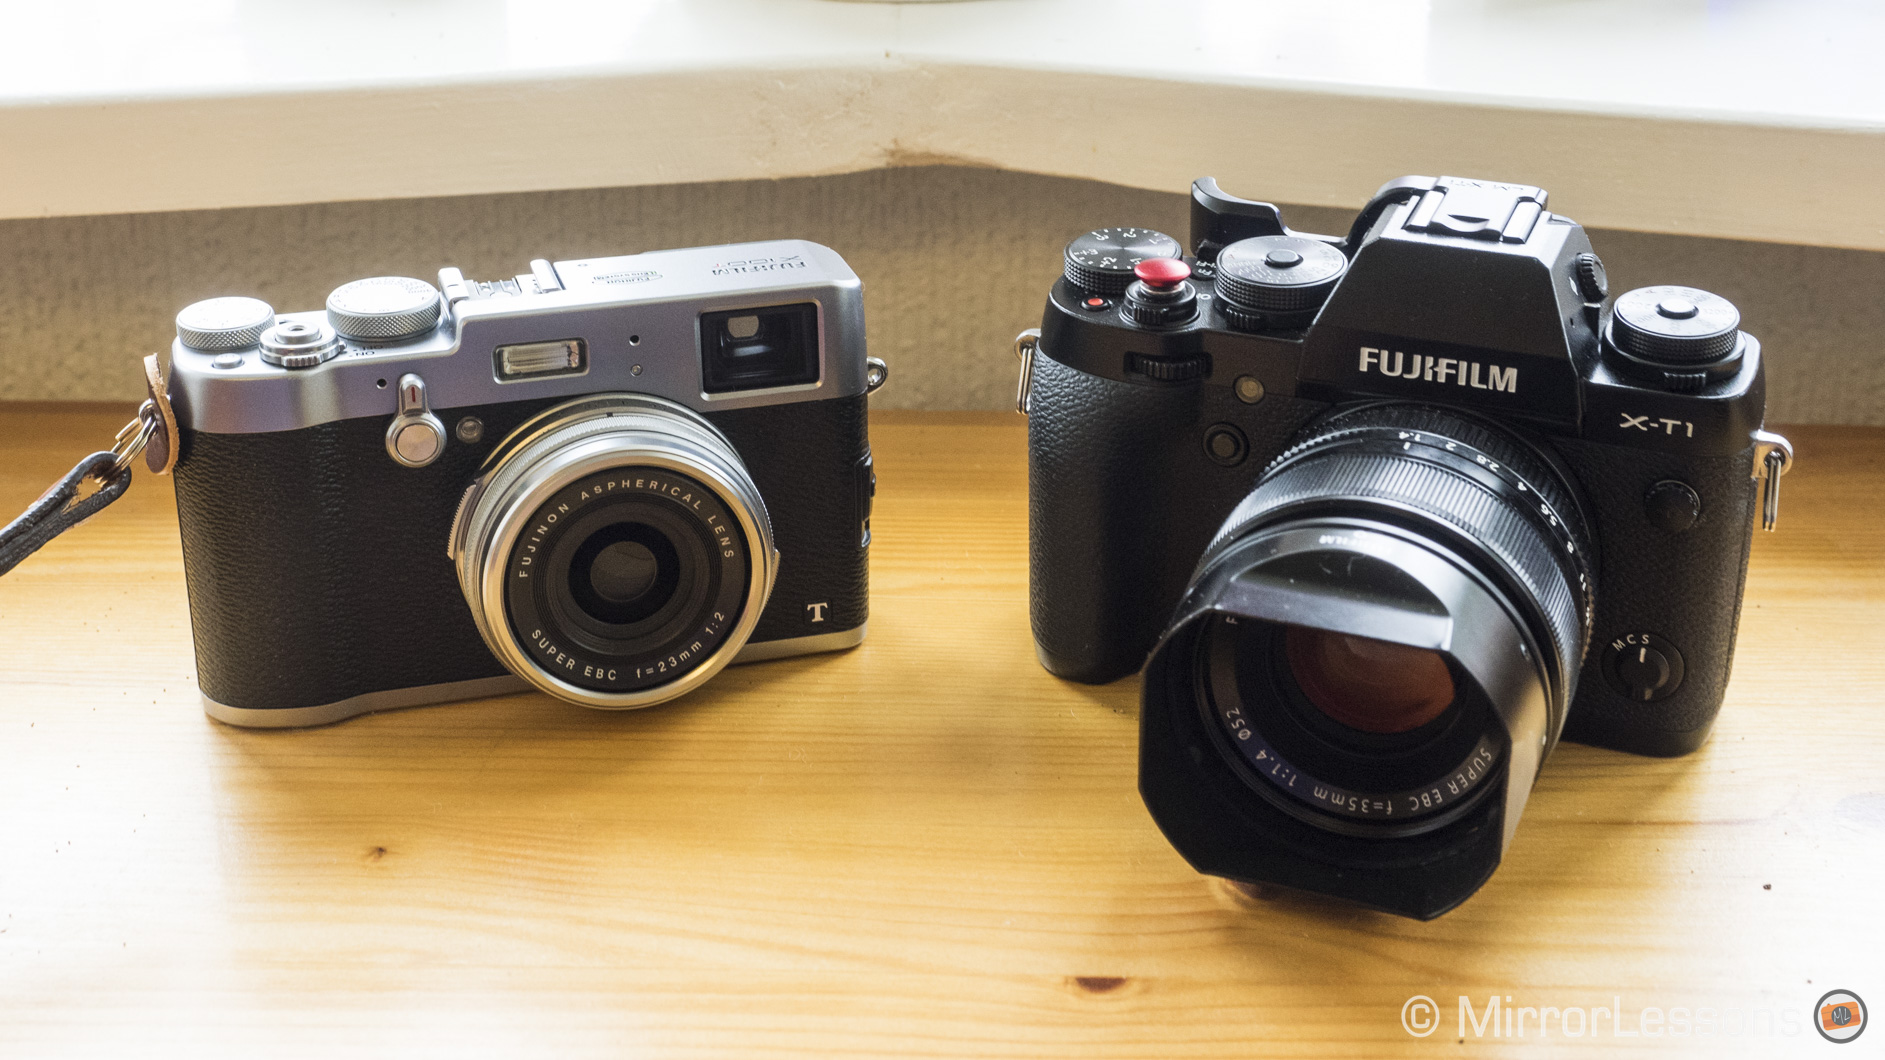 Fujifilm X100T vs  Fujifilm X-T1 – Which is the right T for you?